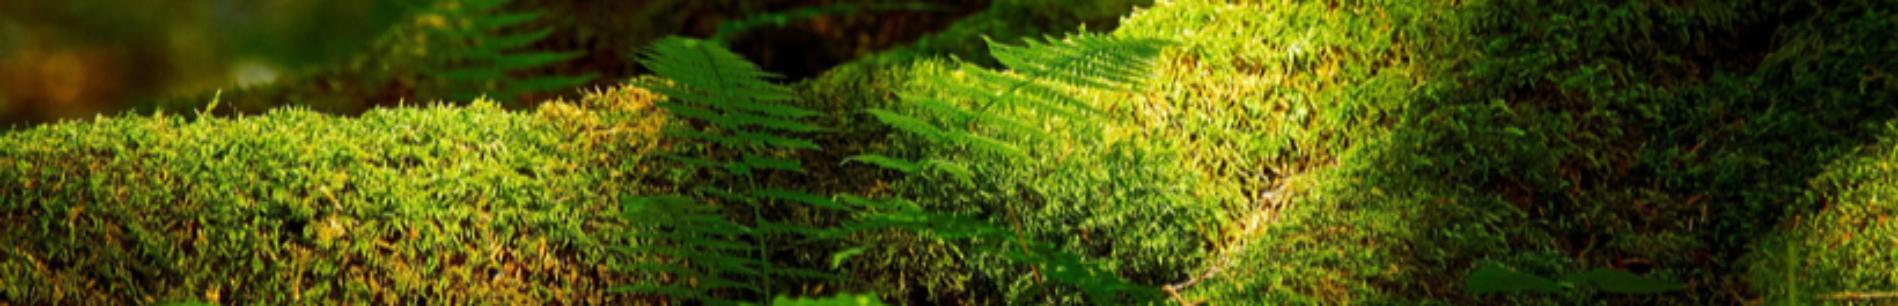 Bandeau Biodiv ©Pixabay-Hagertal